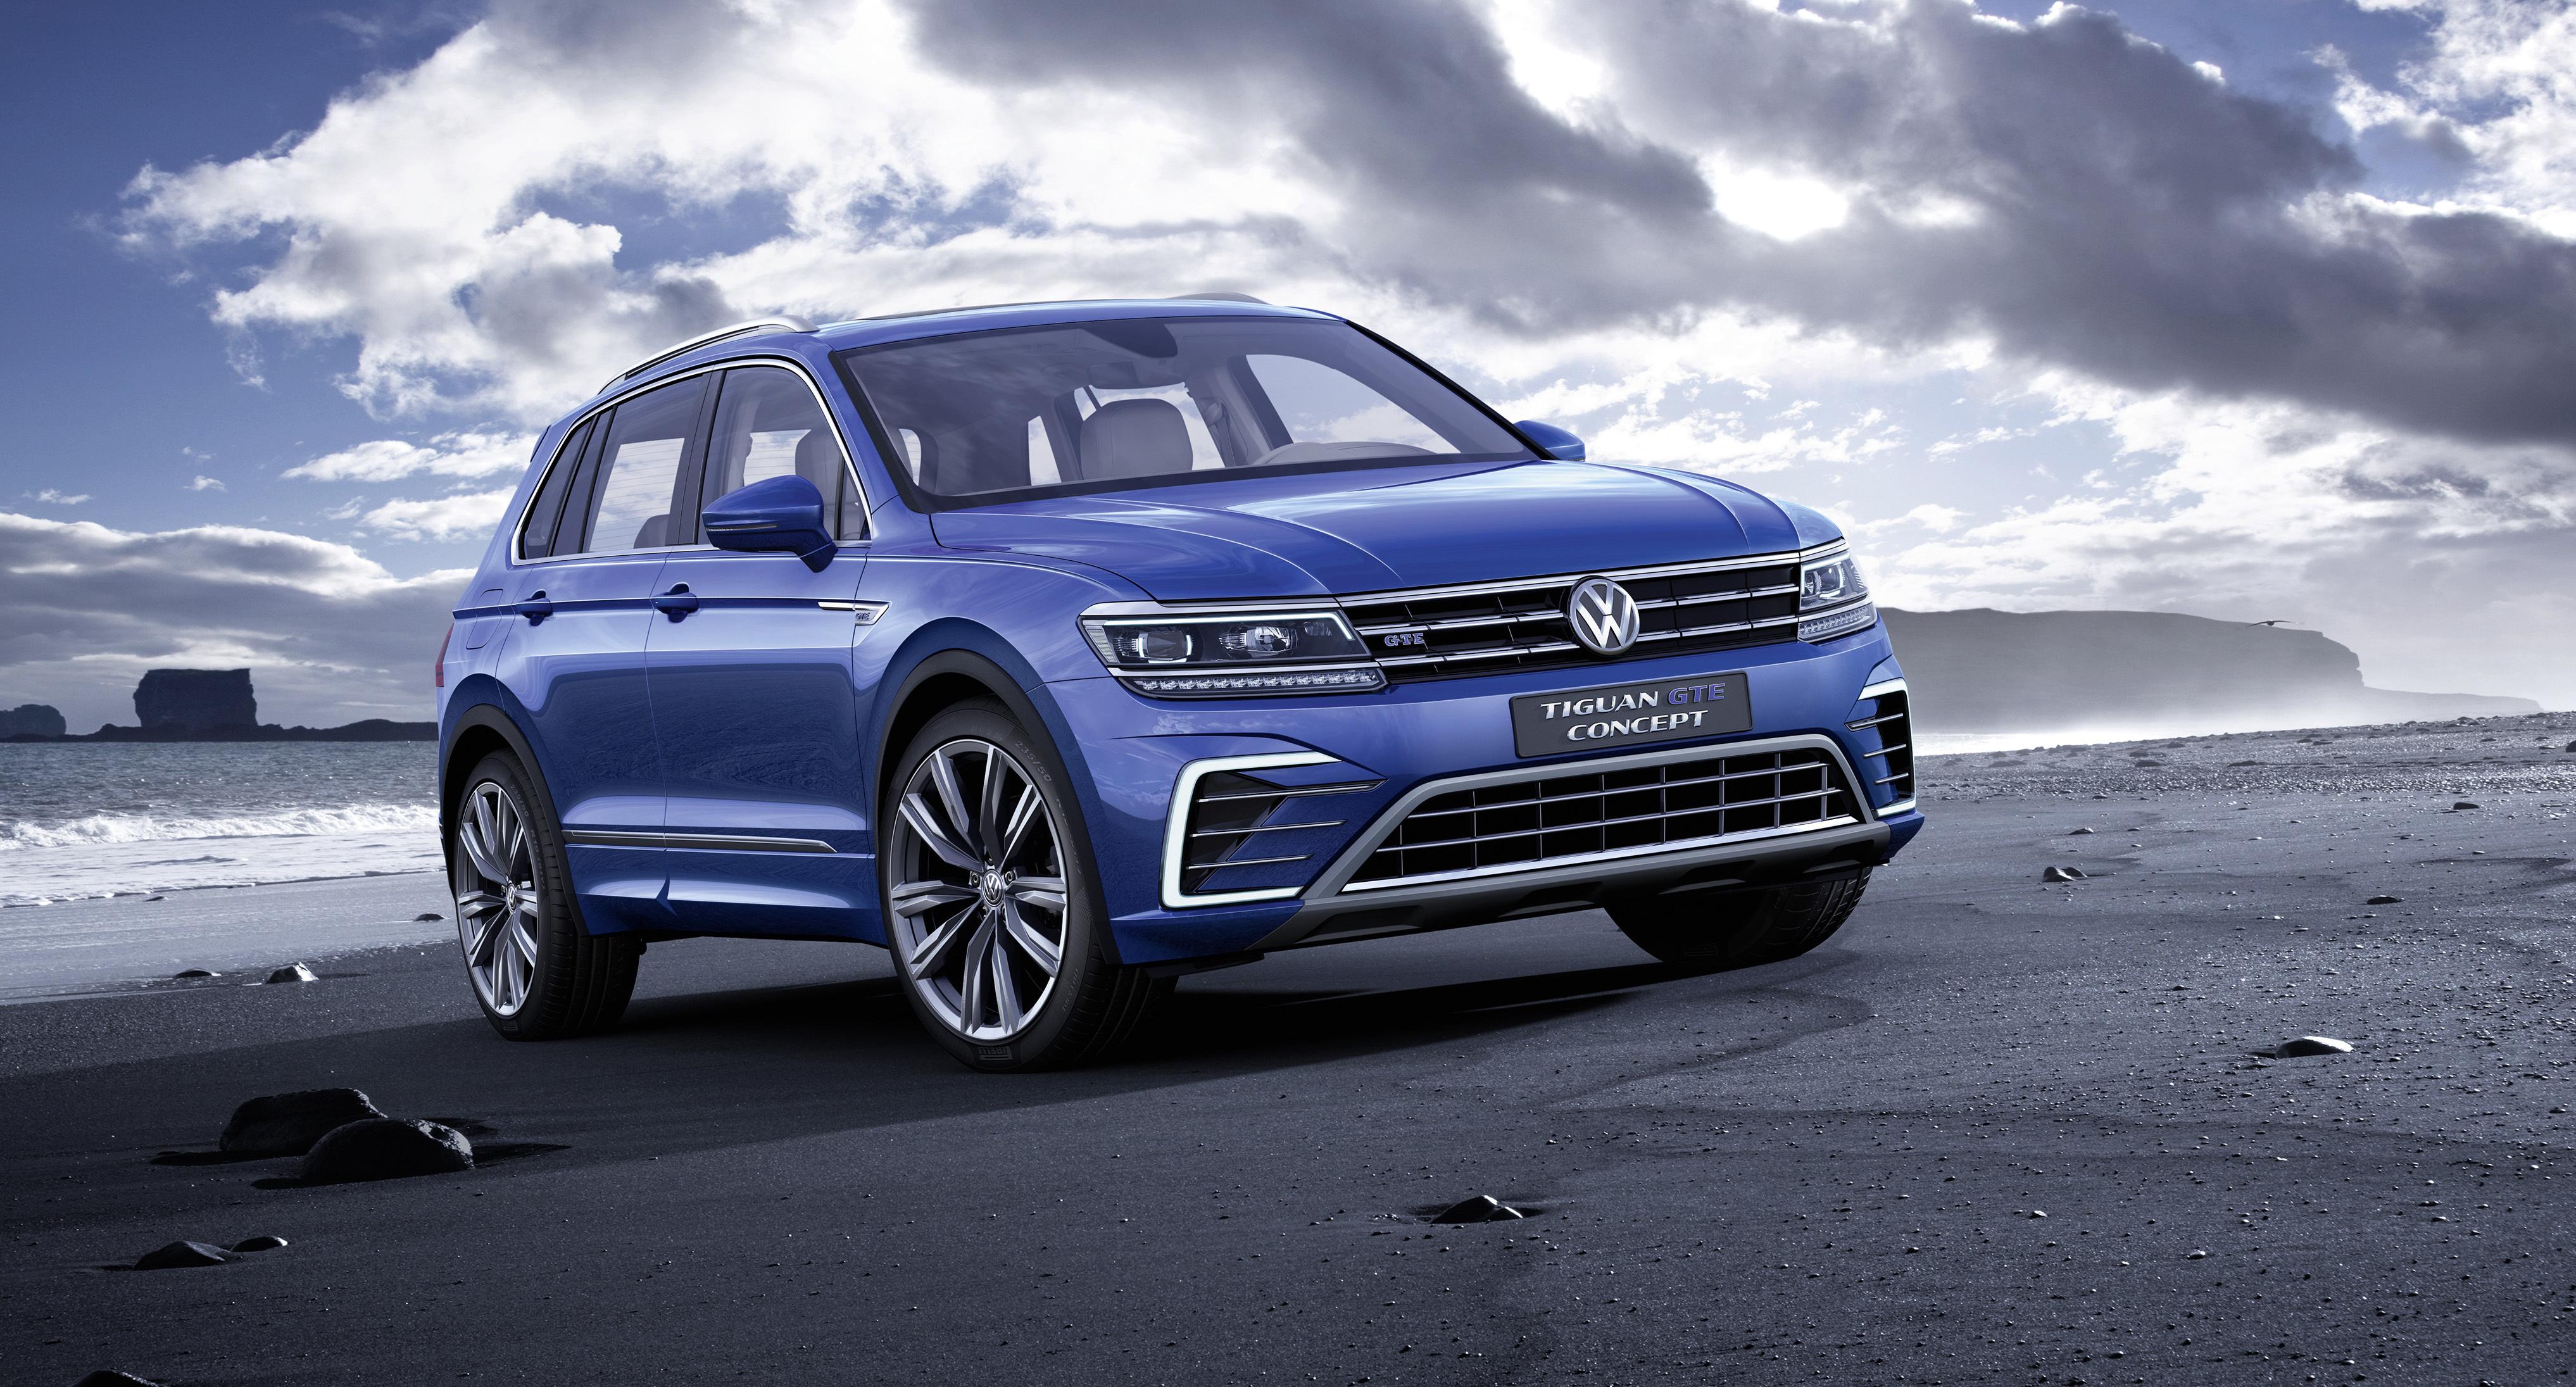 Volkswagen Tiguan 4k Ultra HD Wallpaper and Background Image  4069x2191  ID:687527